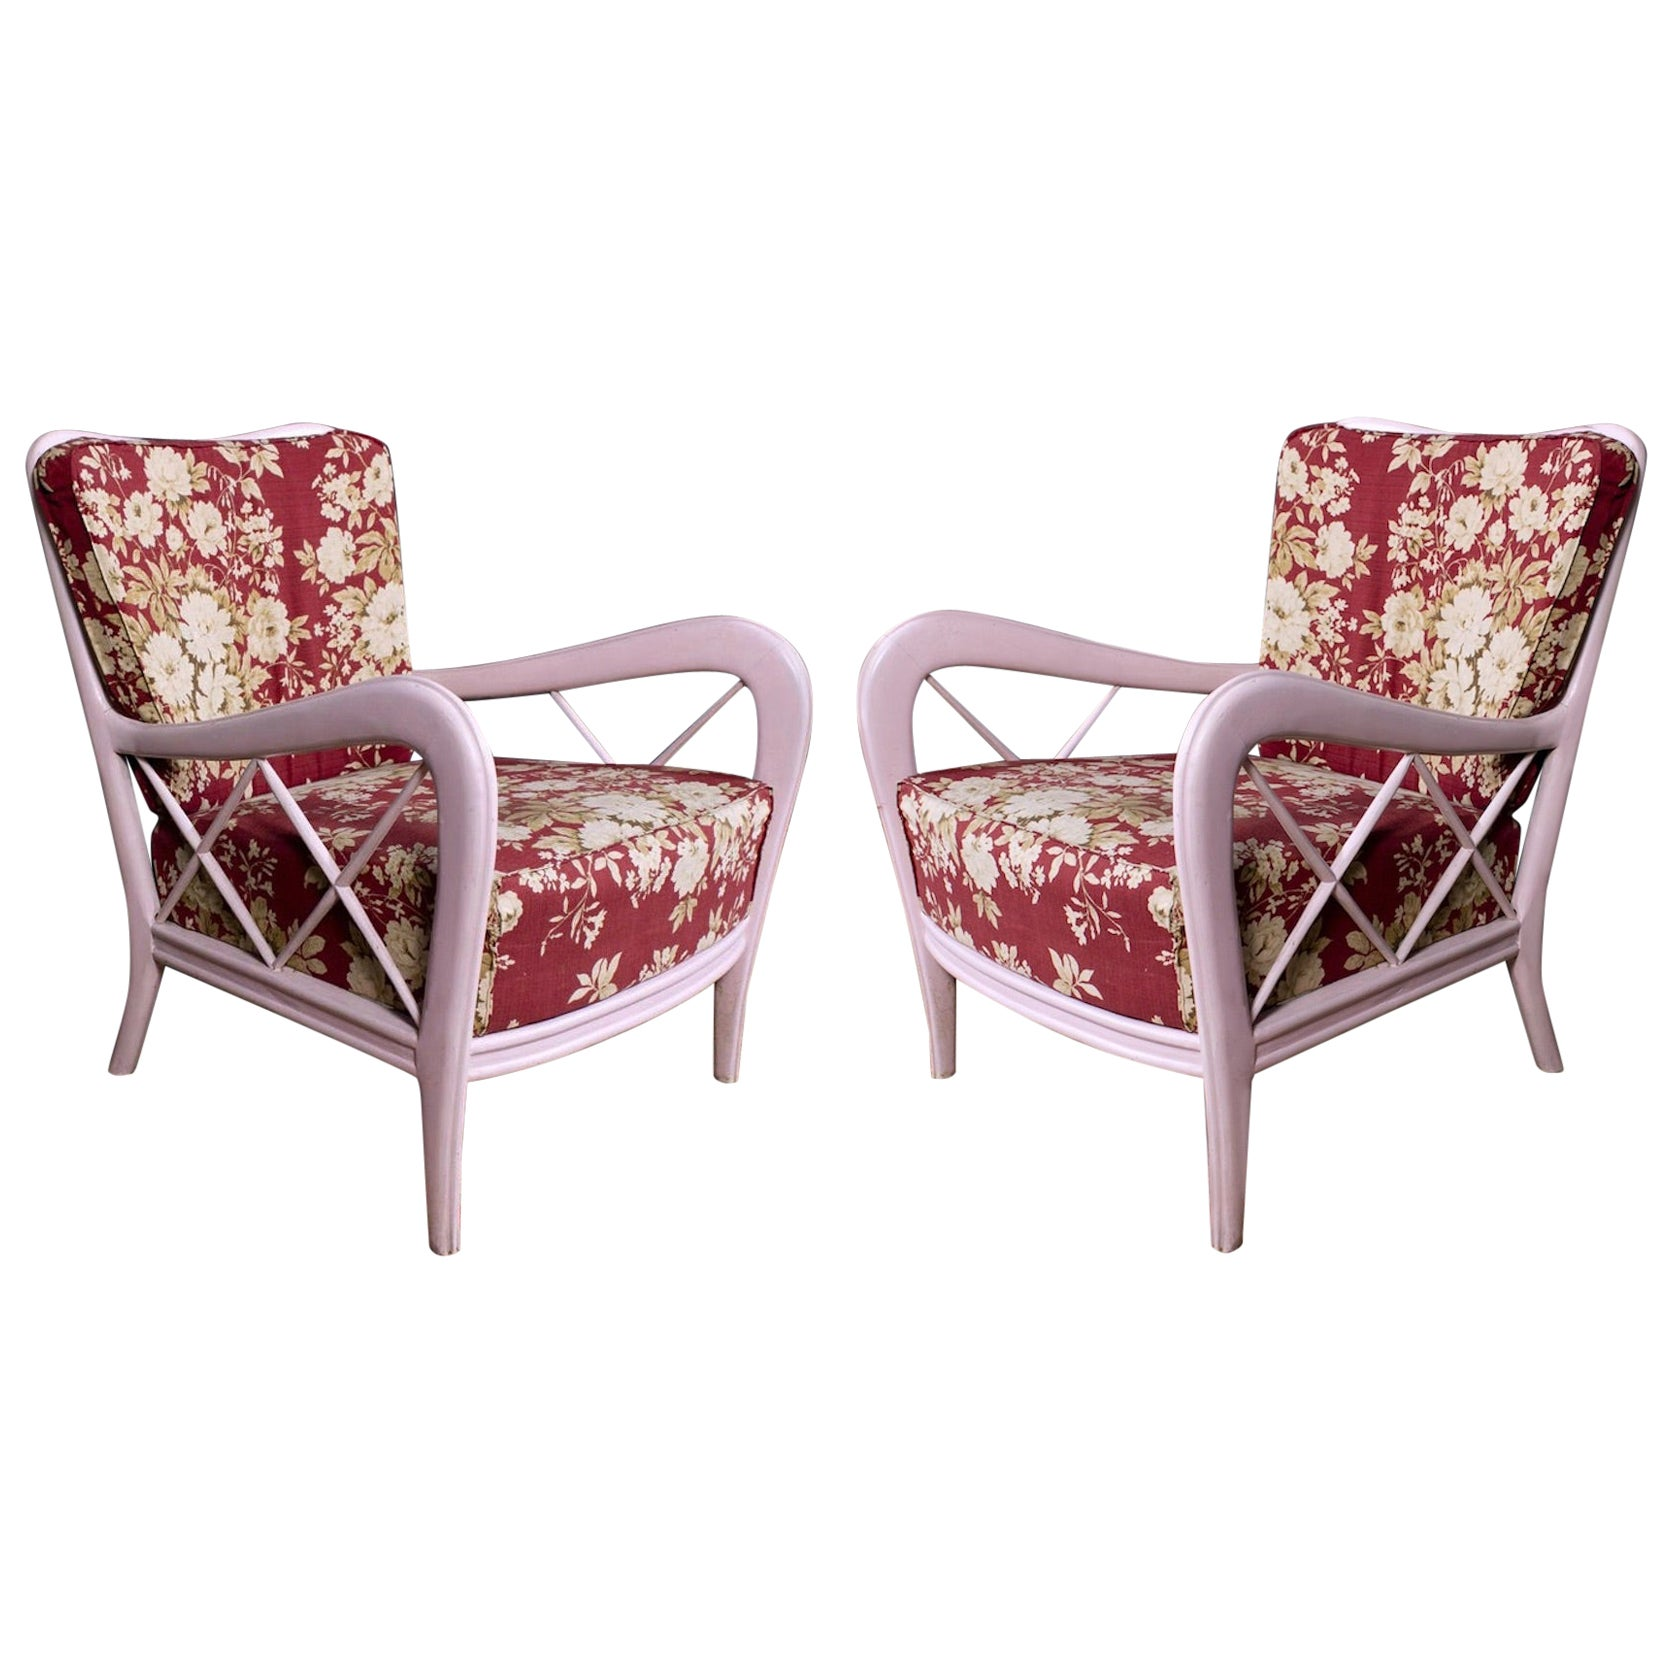 Pair of Pink Italian Midcentury Armchairs Paolo Buffa Style, 1950s